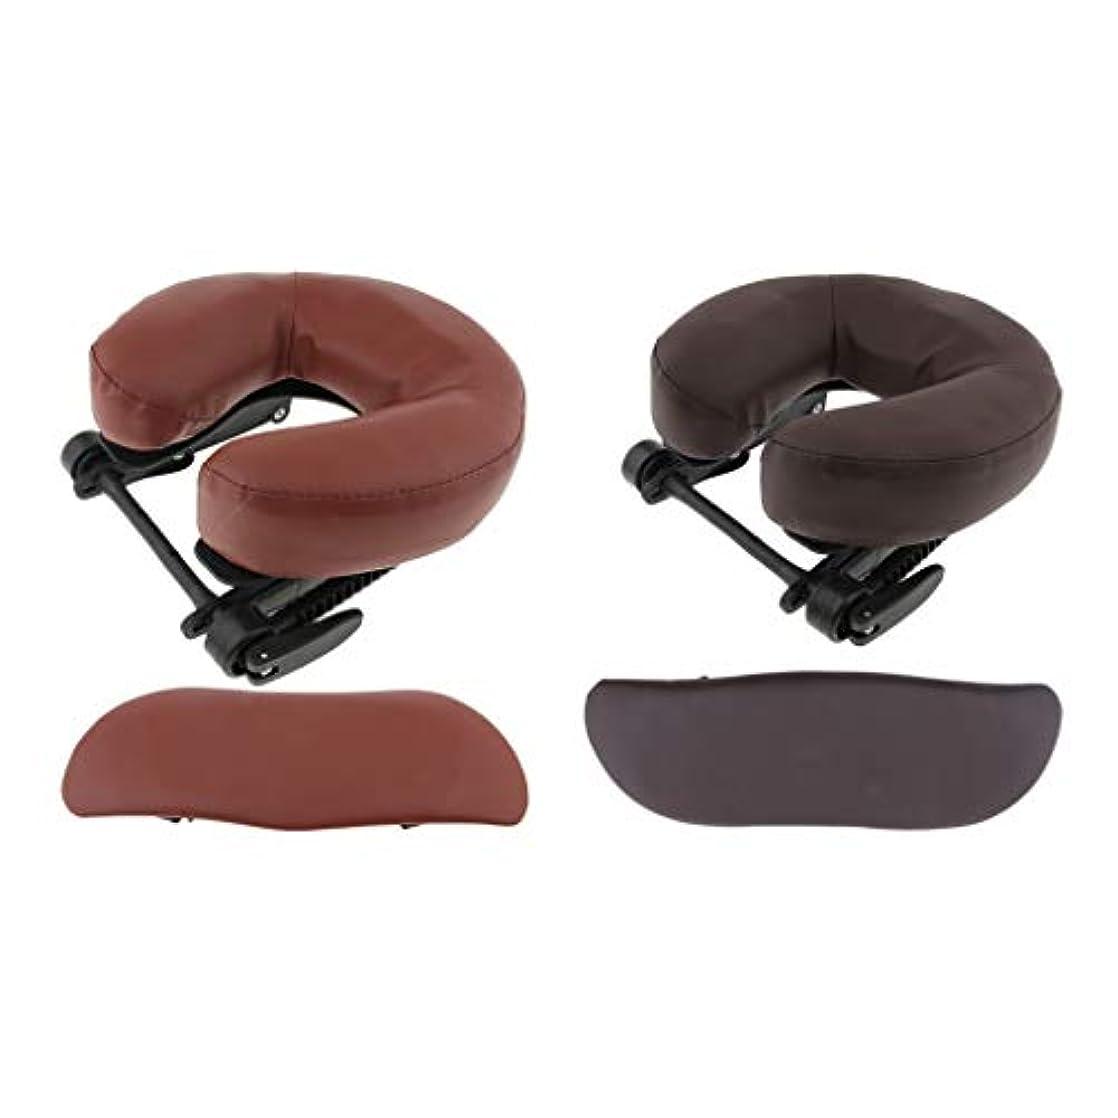 Hellery アームサポート マッサージ 枕クッション 2個セット 耐久性